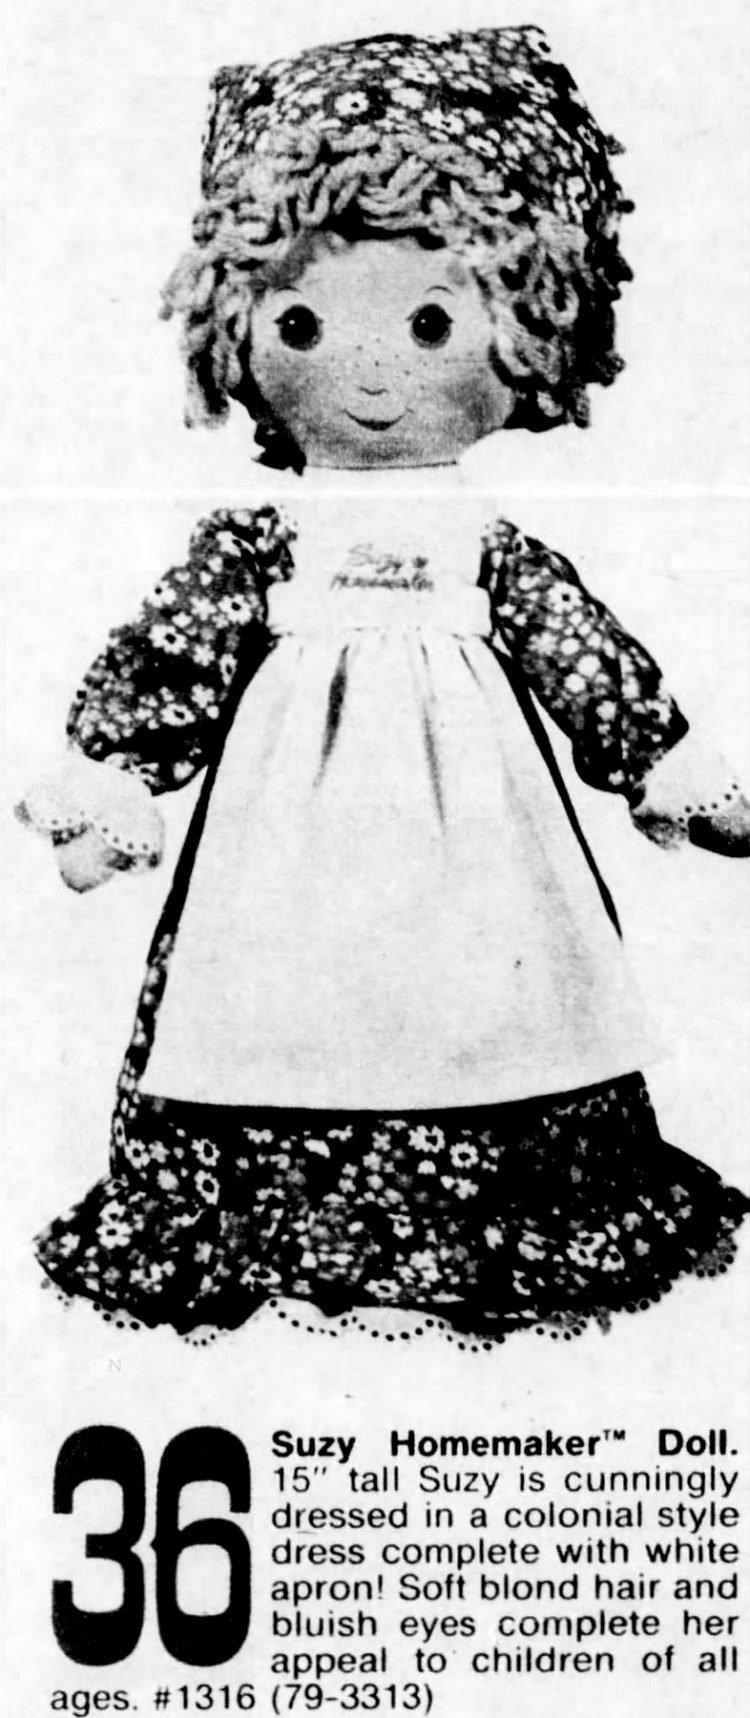 Suzy Homemaker doll from 1976